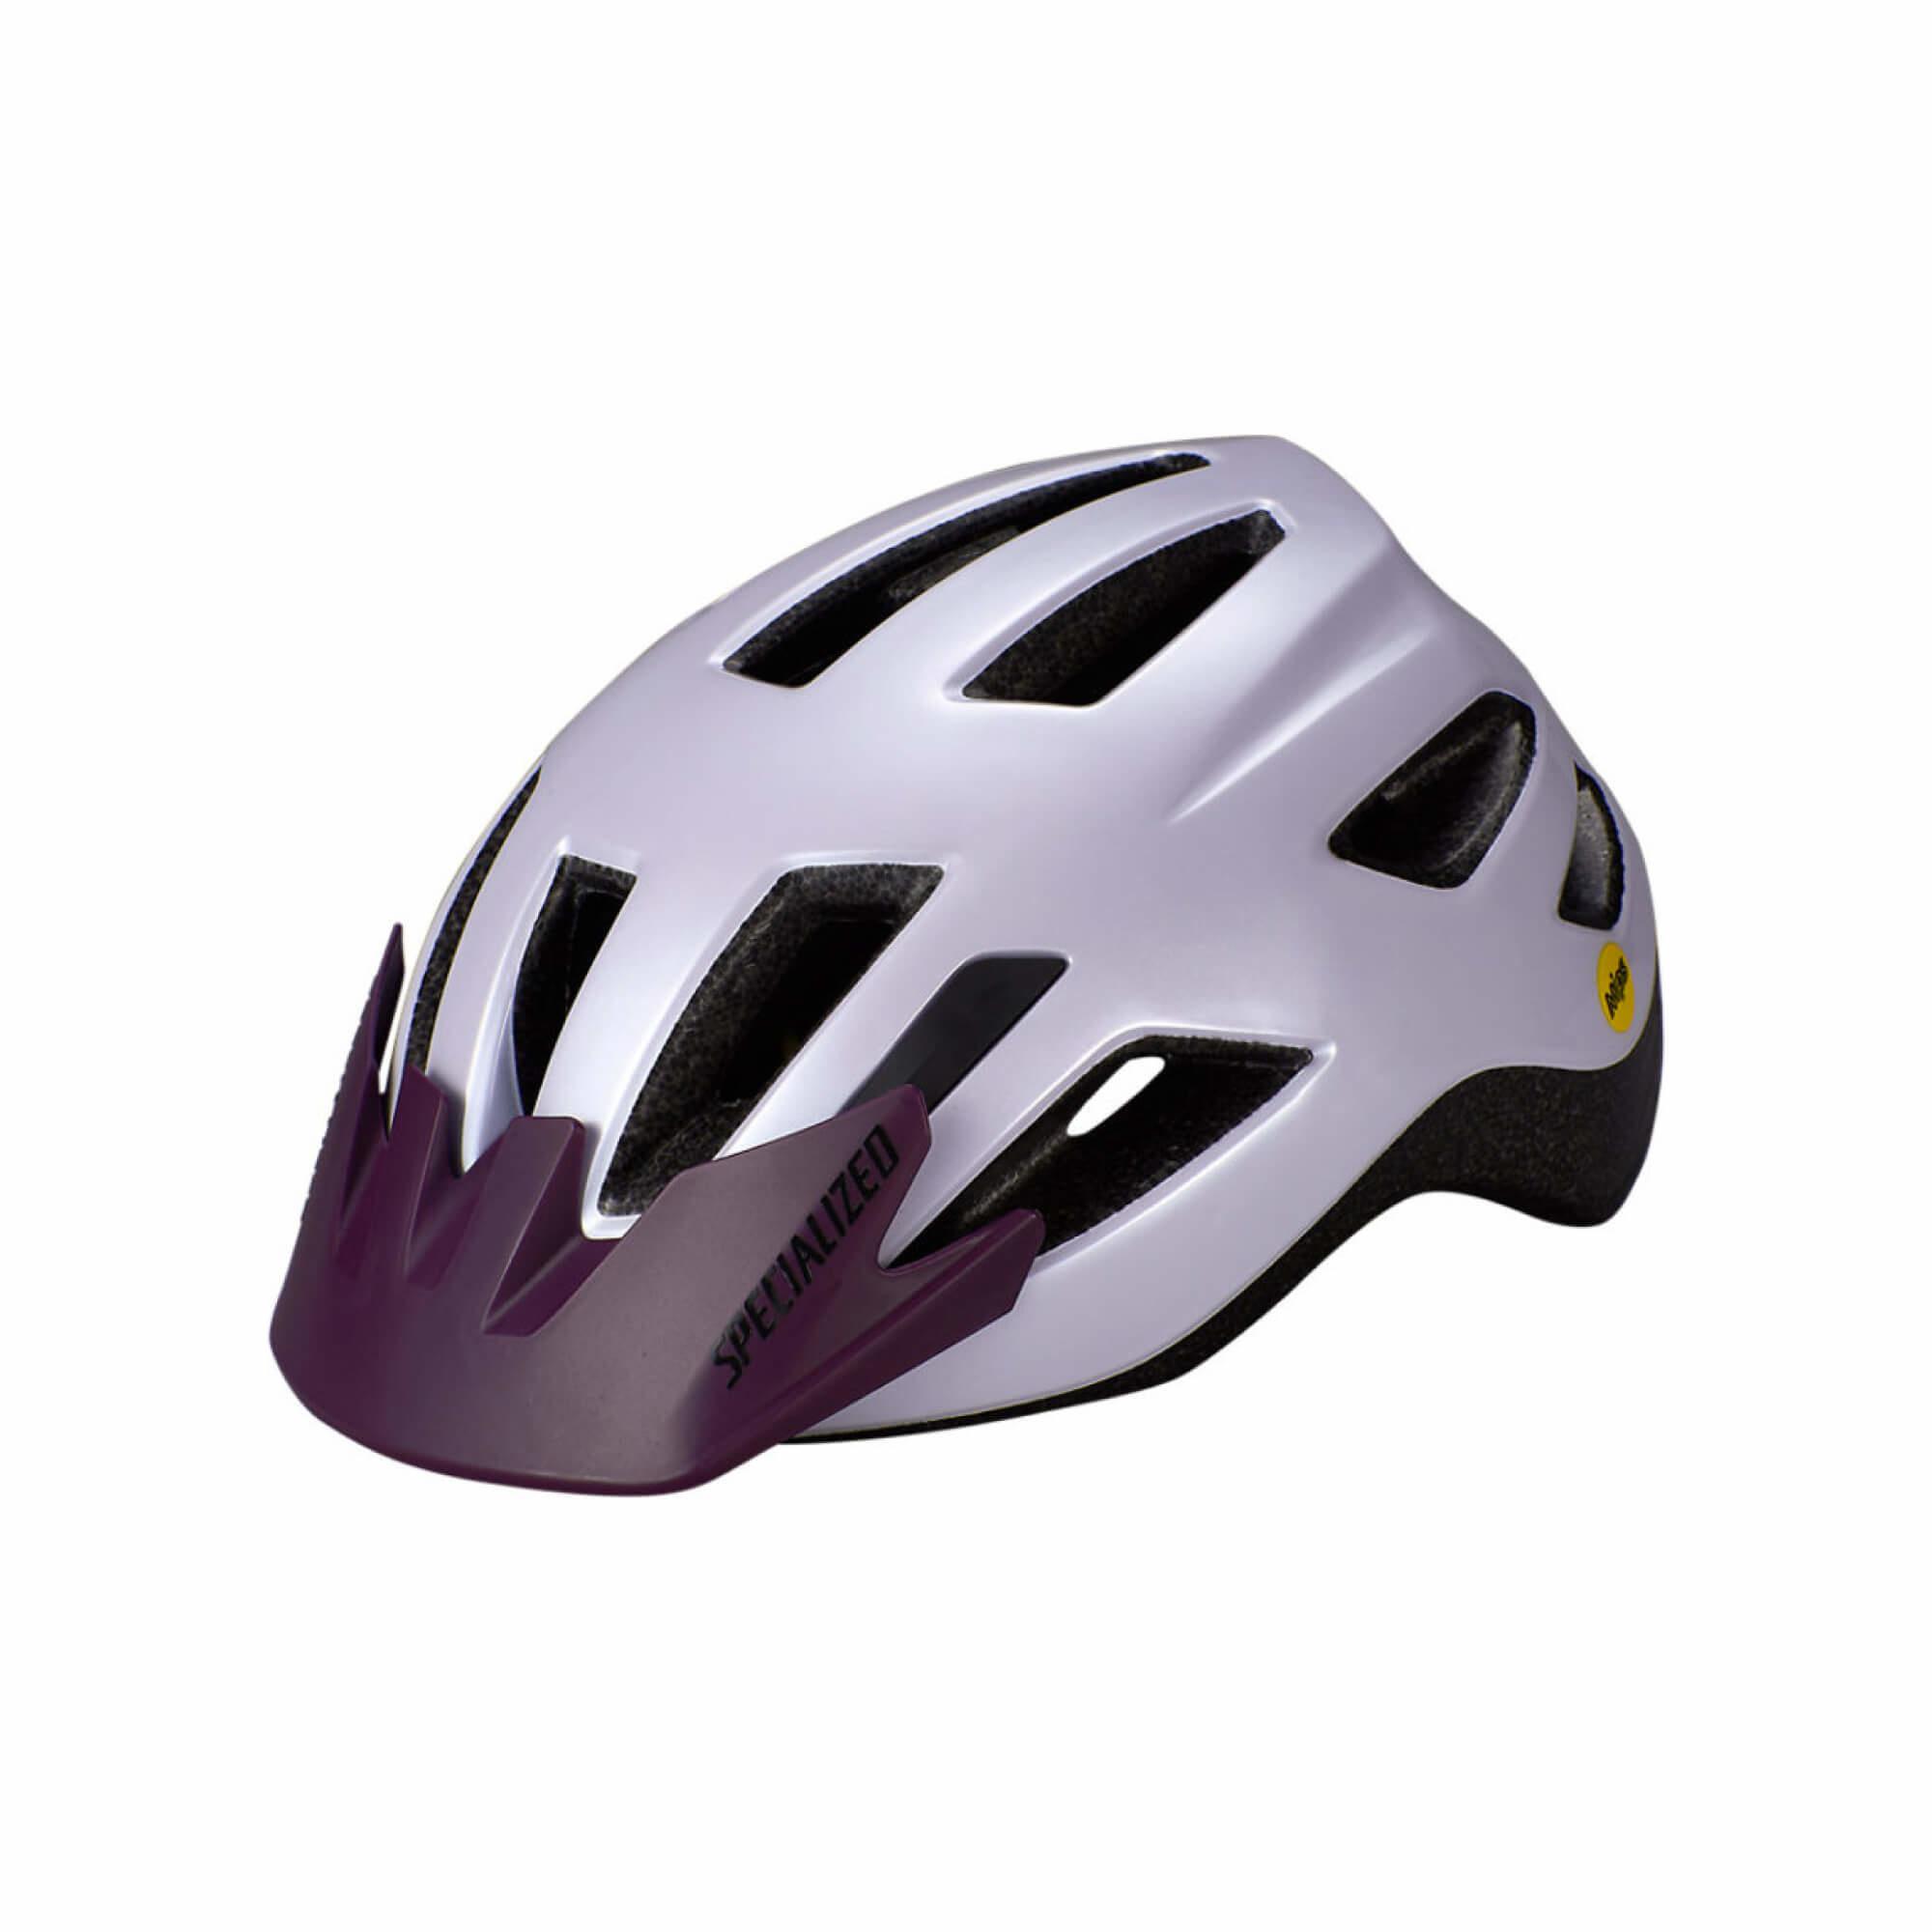 Shuffle Led SB Helmet Mips Child-1